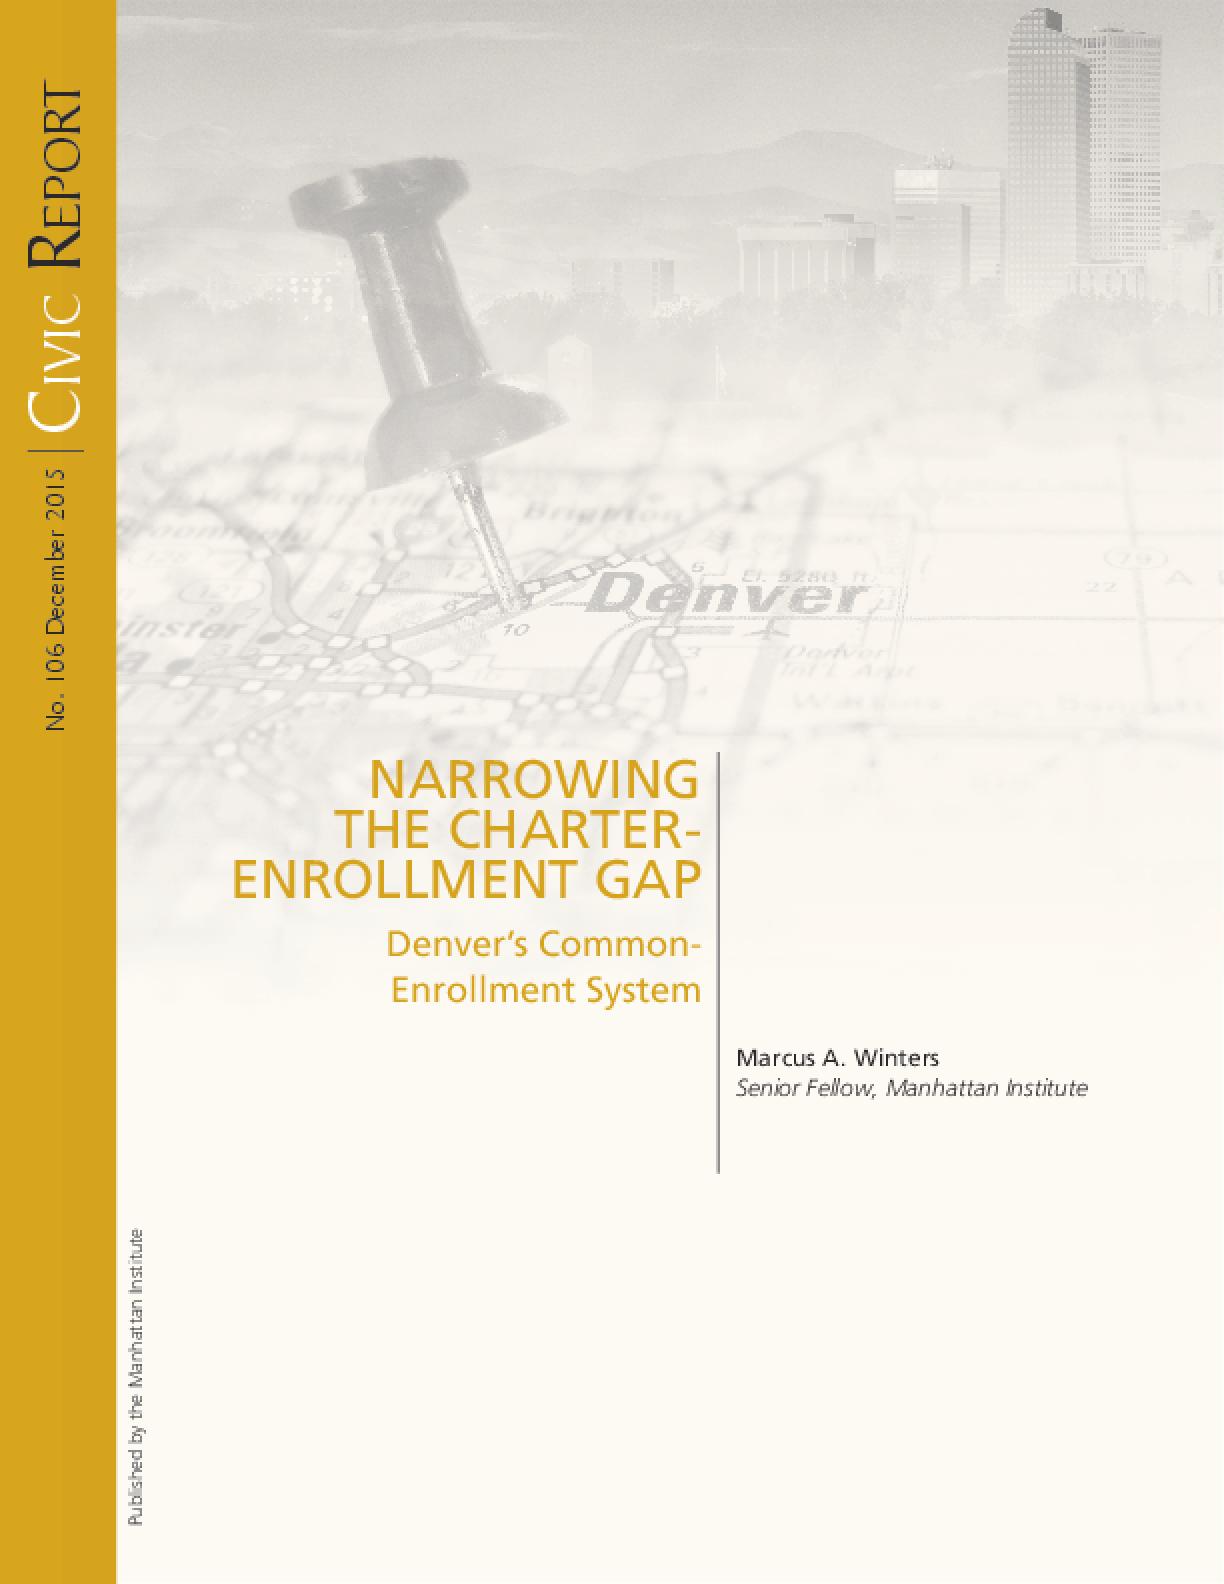 Narrowing The Charter Enrollment Gap: Denver's Common-Enrollment System